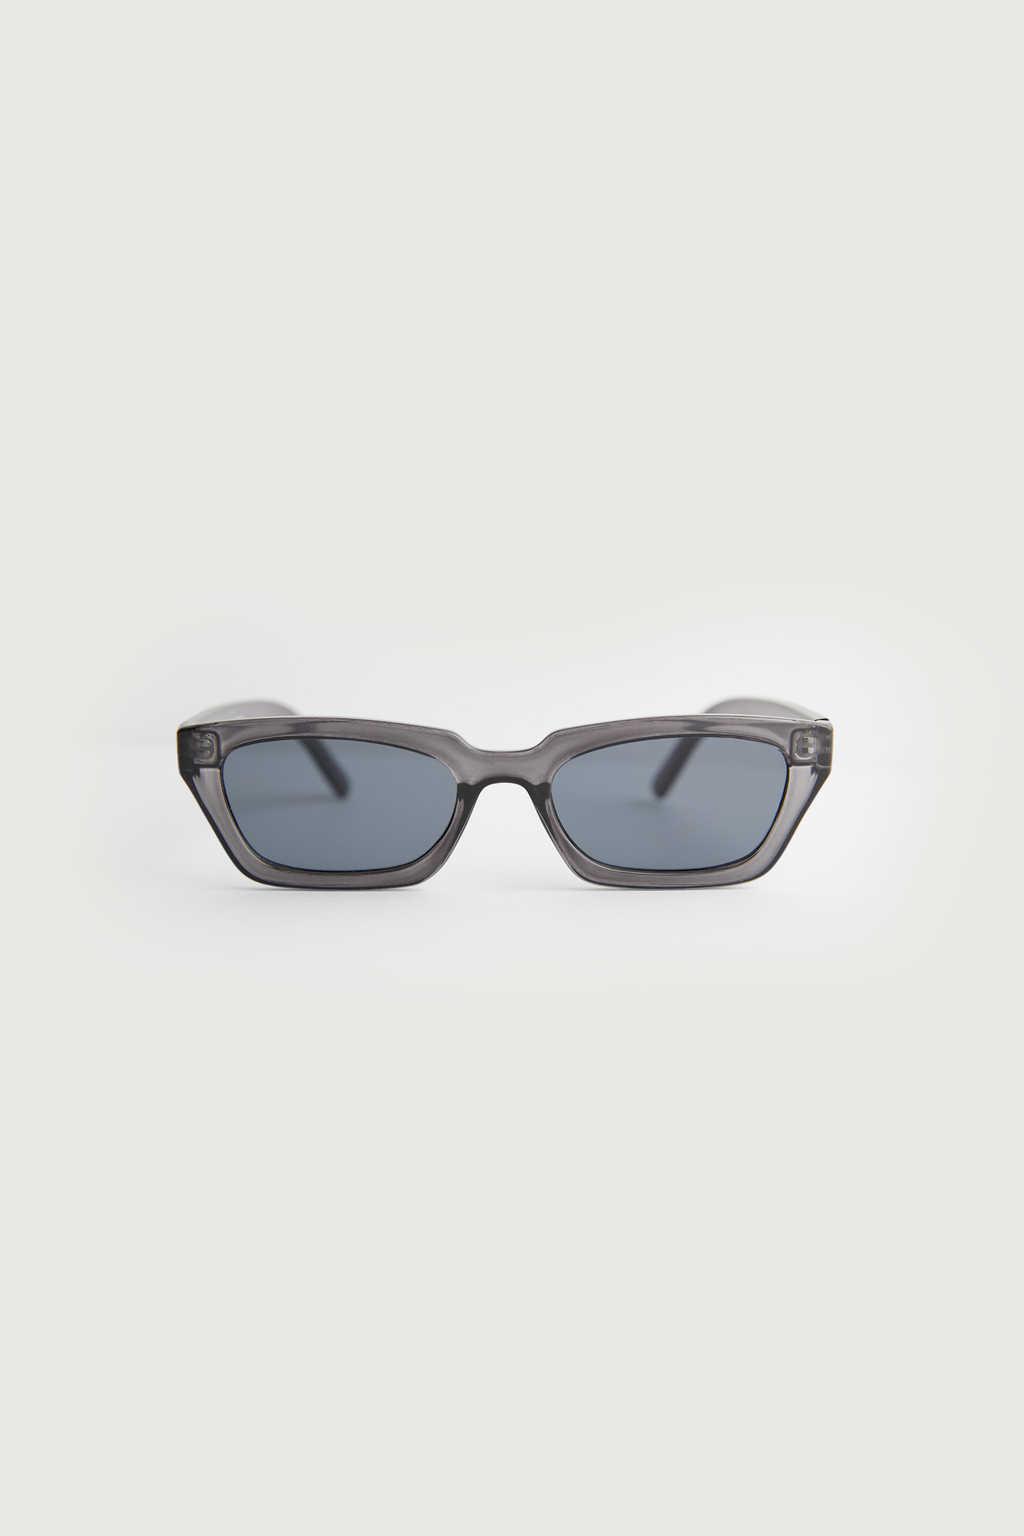 Sunglass 3366 Black 5